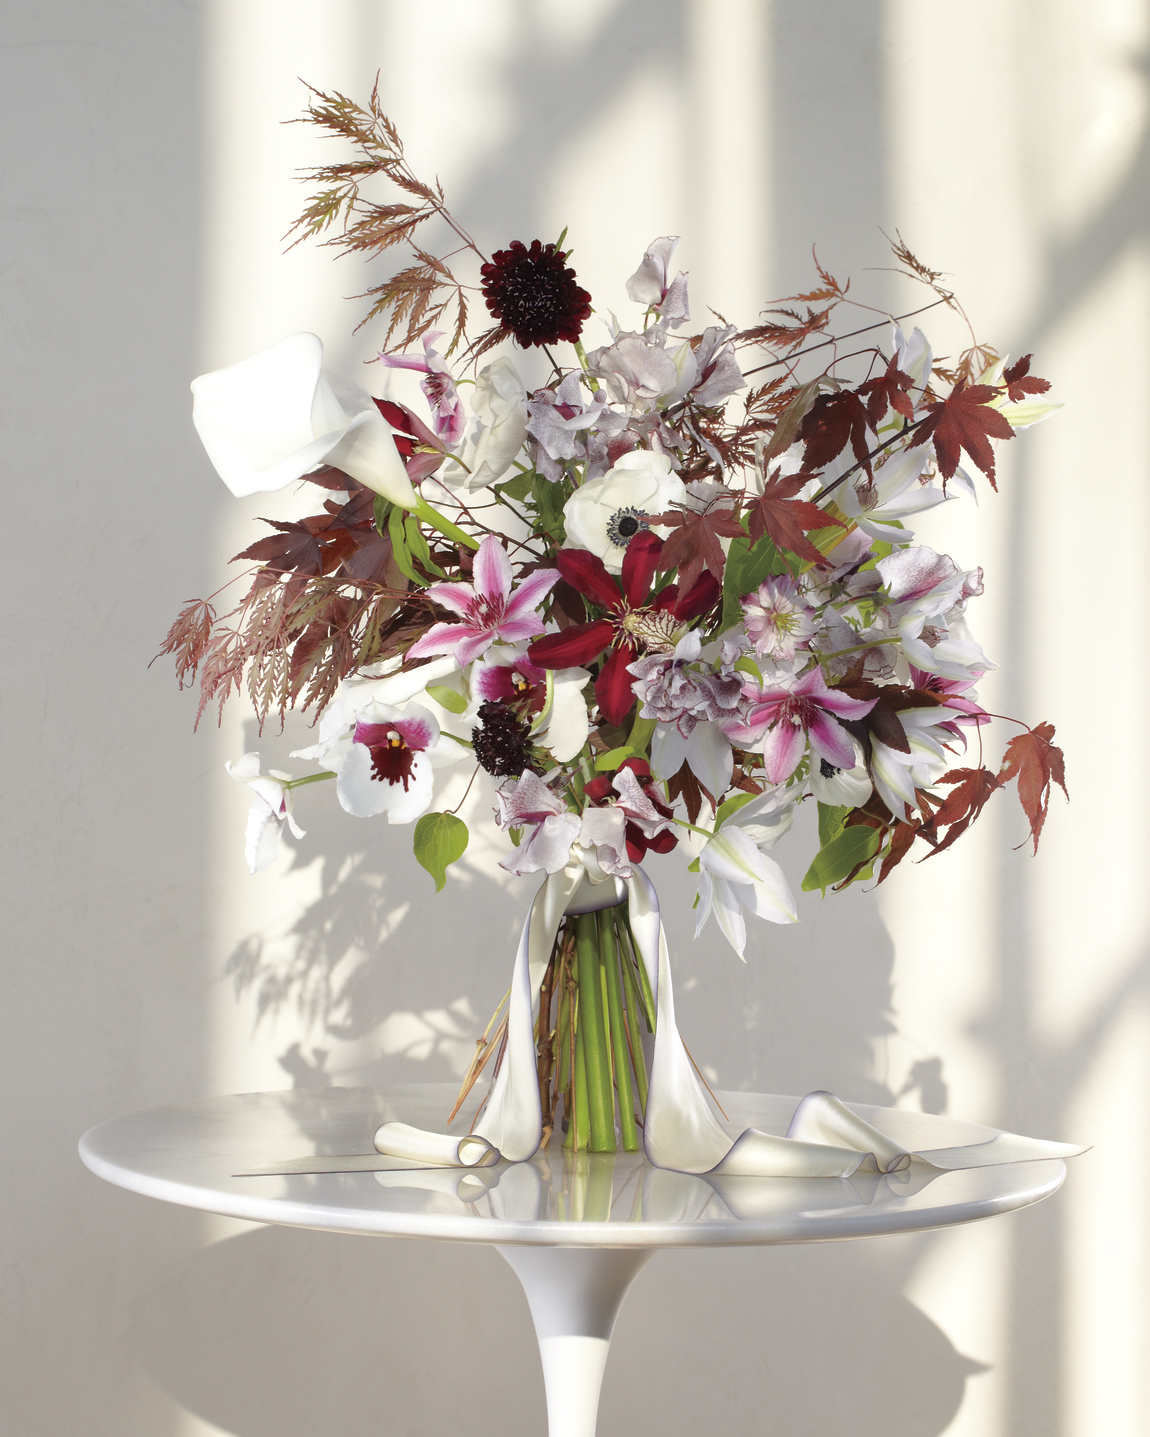 flowers-modern-city-632-mwd108999.jpg